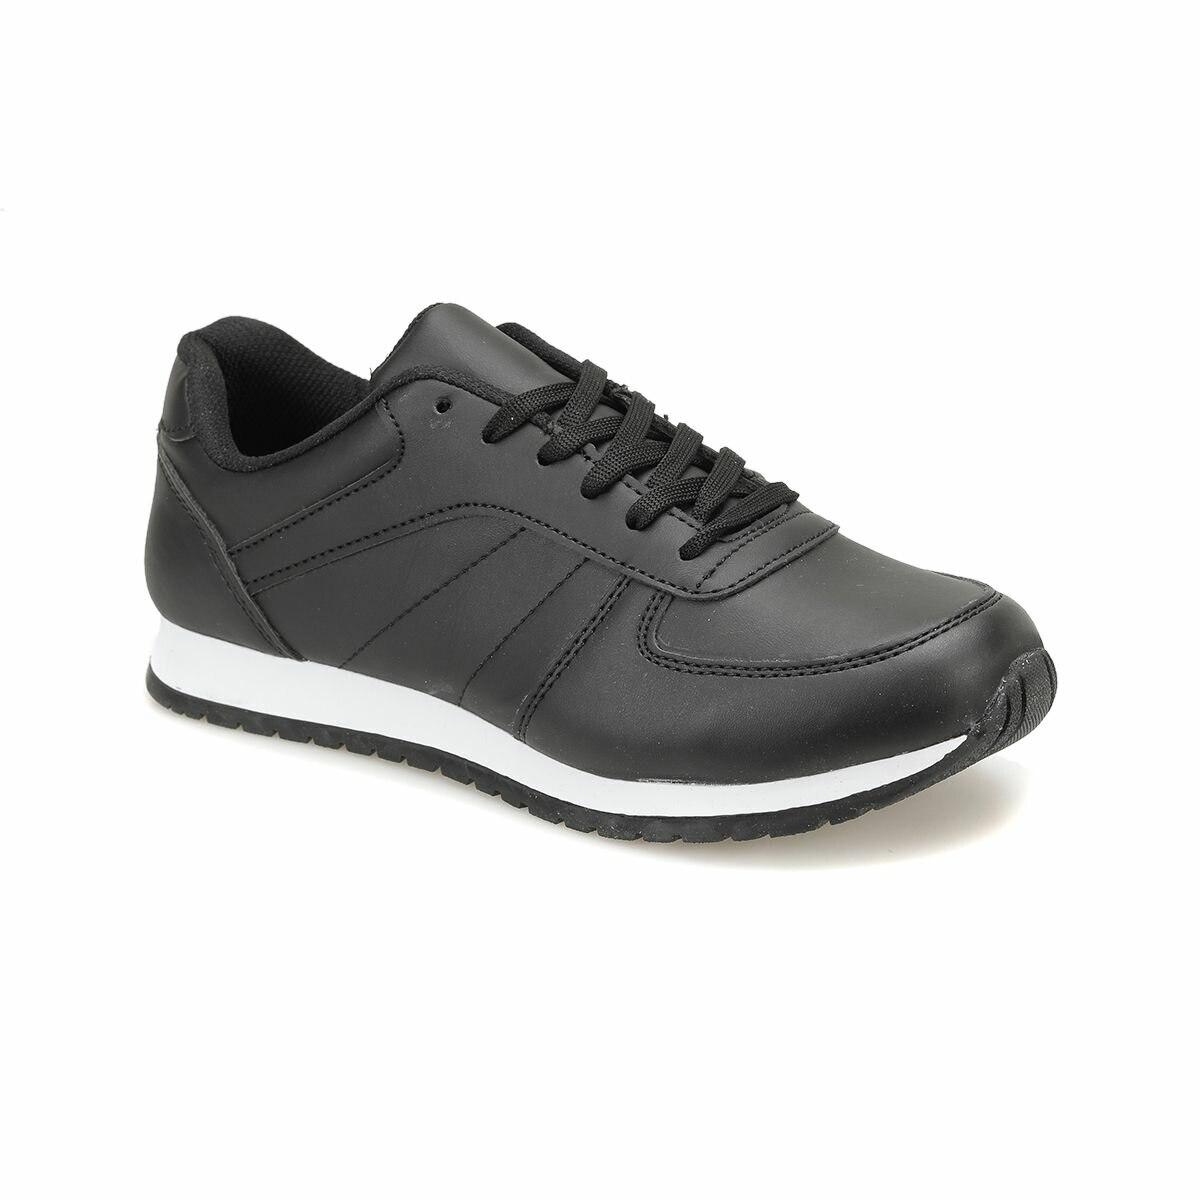 FLO DARIO W Black Women 'S Sneaker Shoes Torex